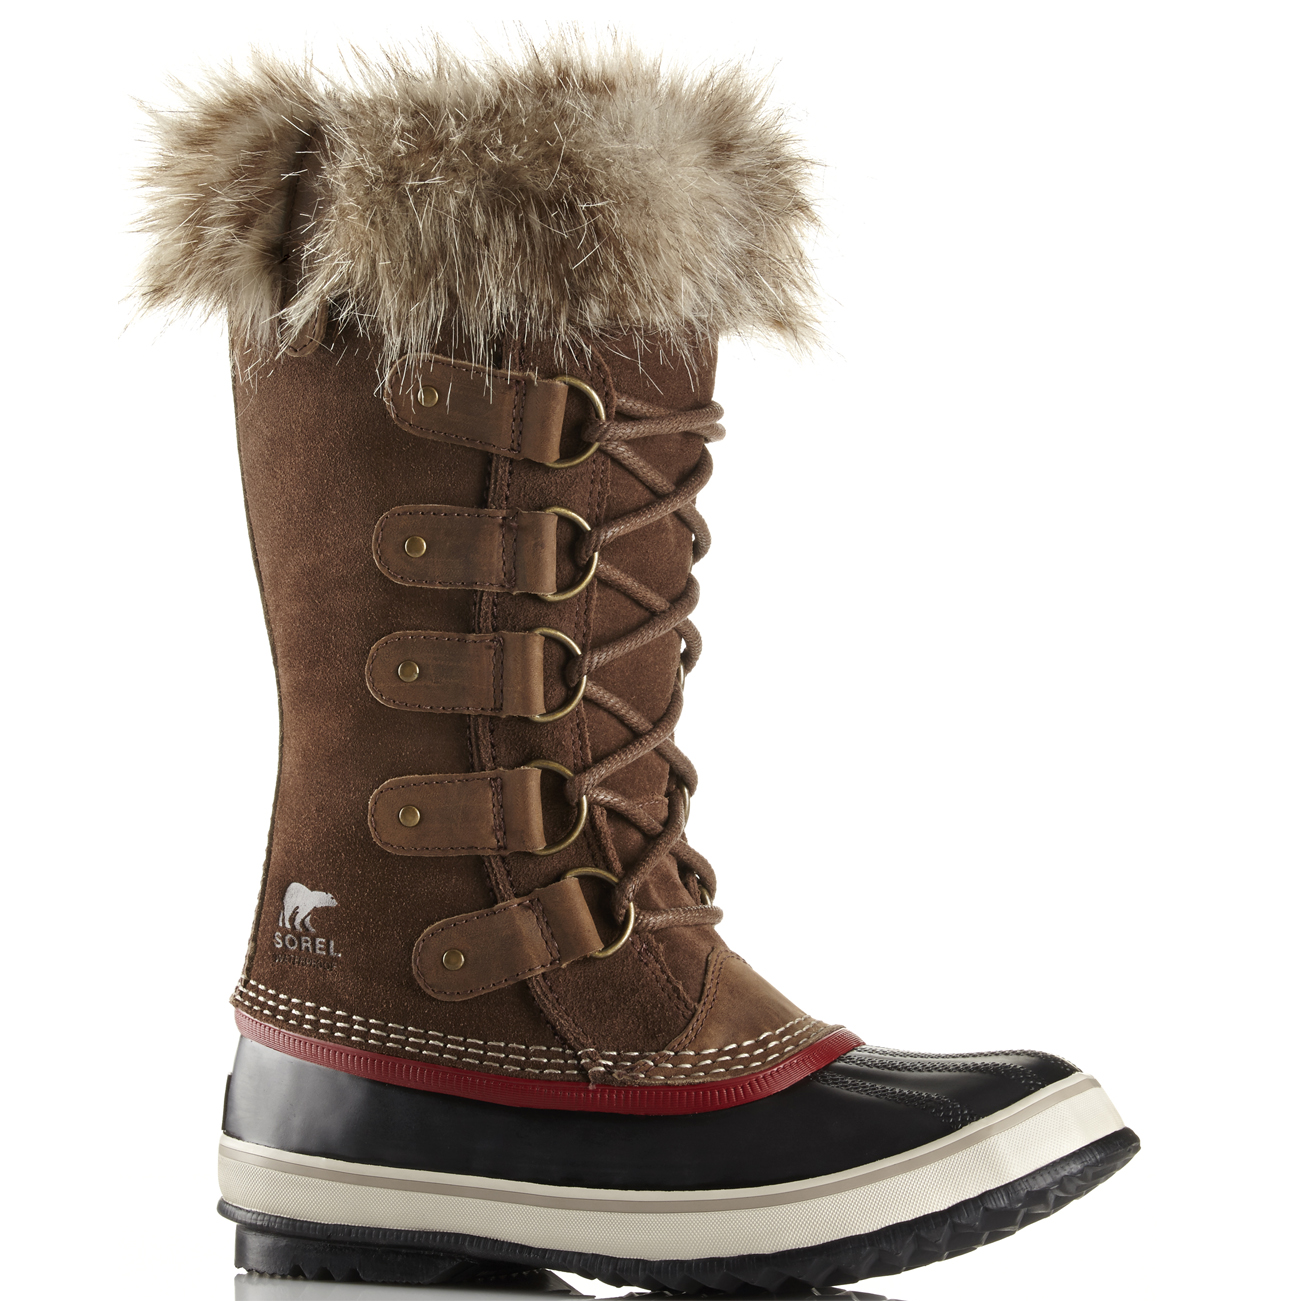 Womens Sorel Joan Of Arctic Winter Rain Waterproof 3-9 Walking Hiking Boots UK 3-9 Waterproof 439e08